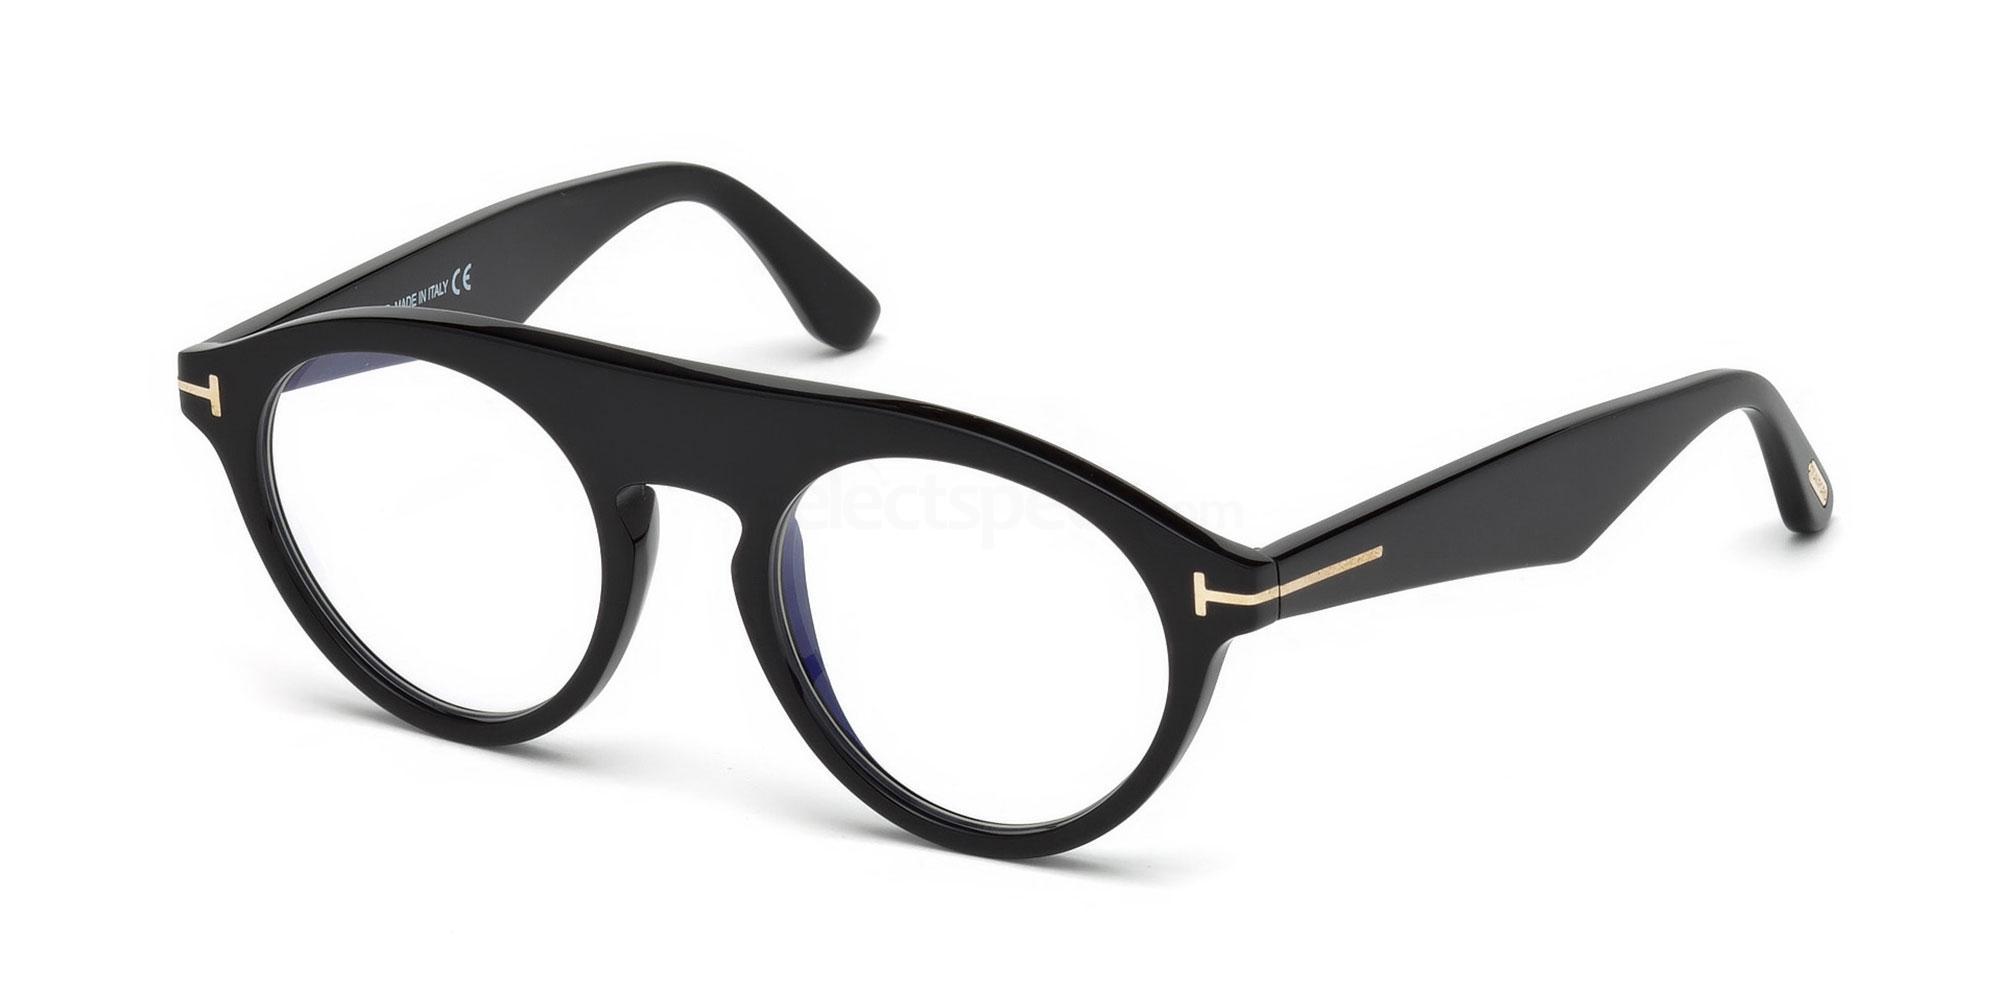 001 FT0633 Sunglasses, Tom Ford